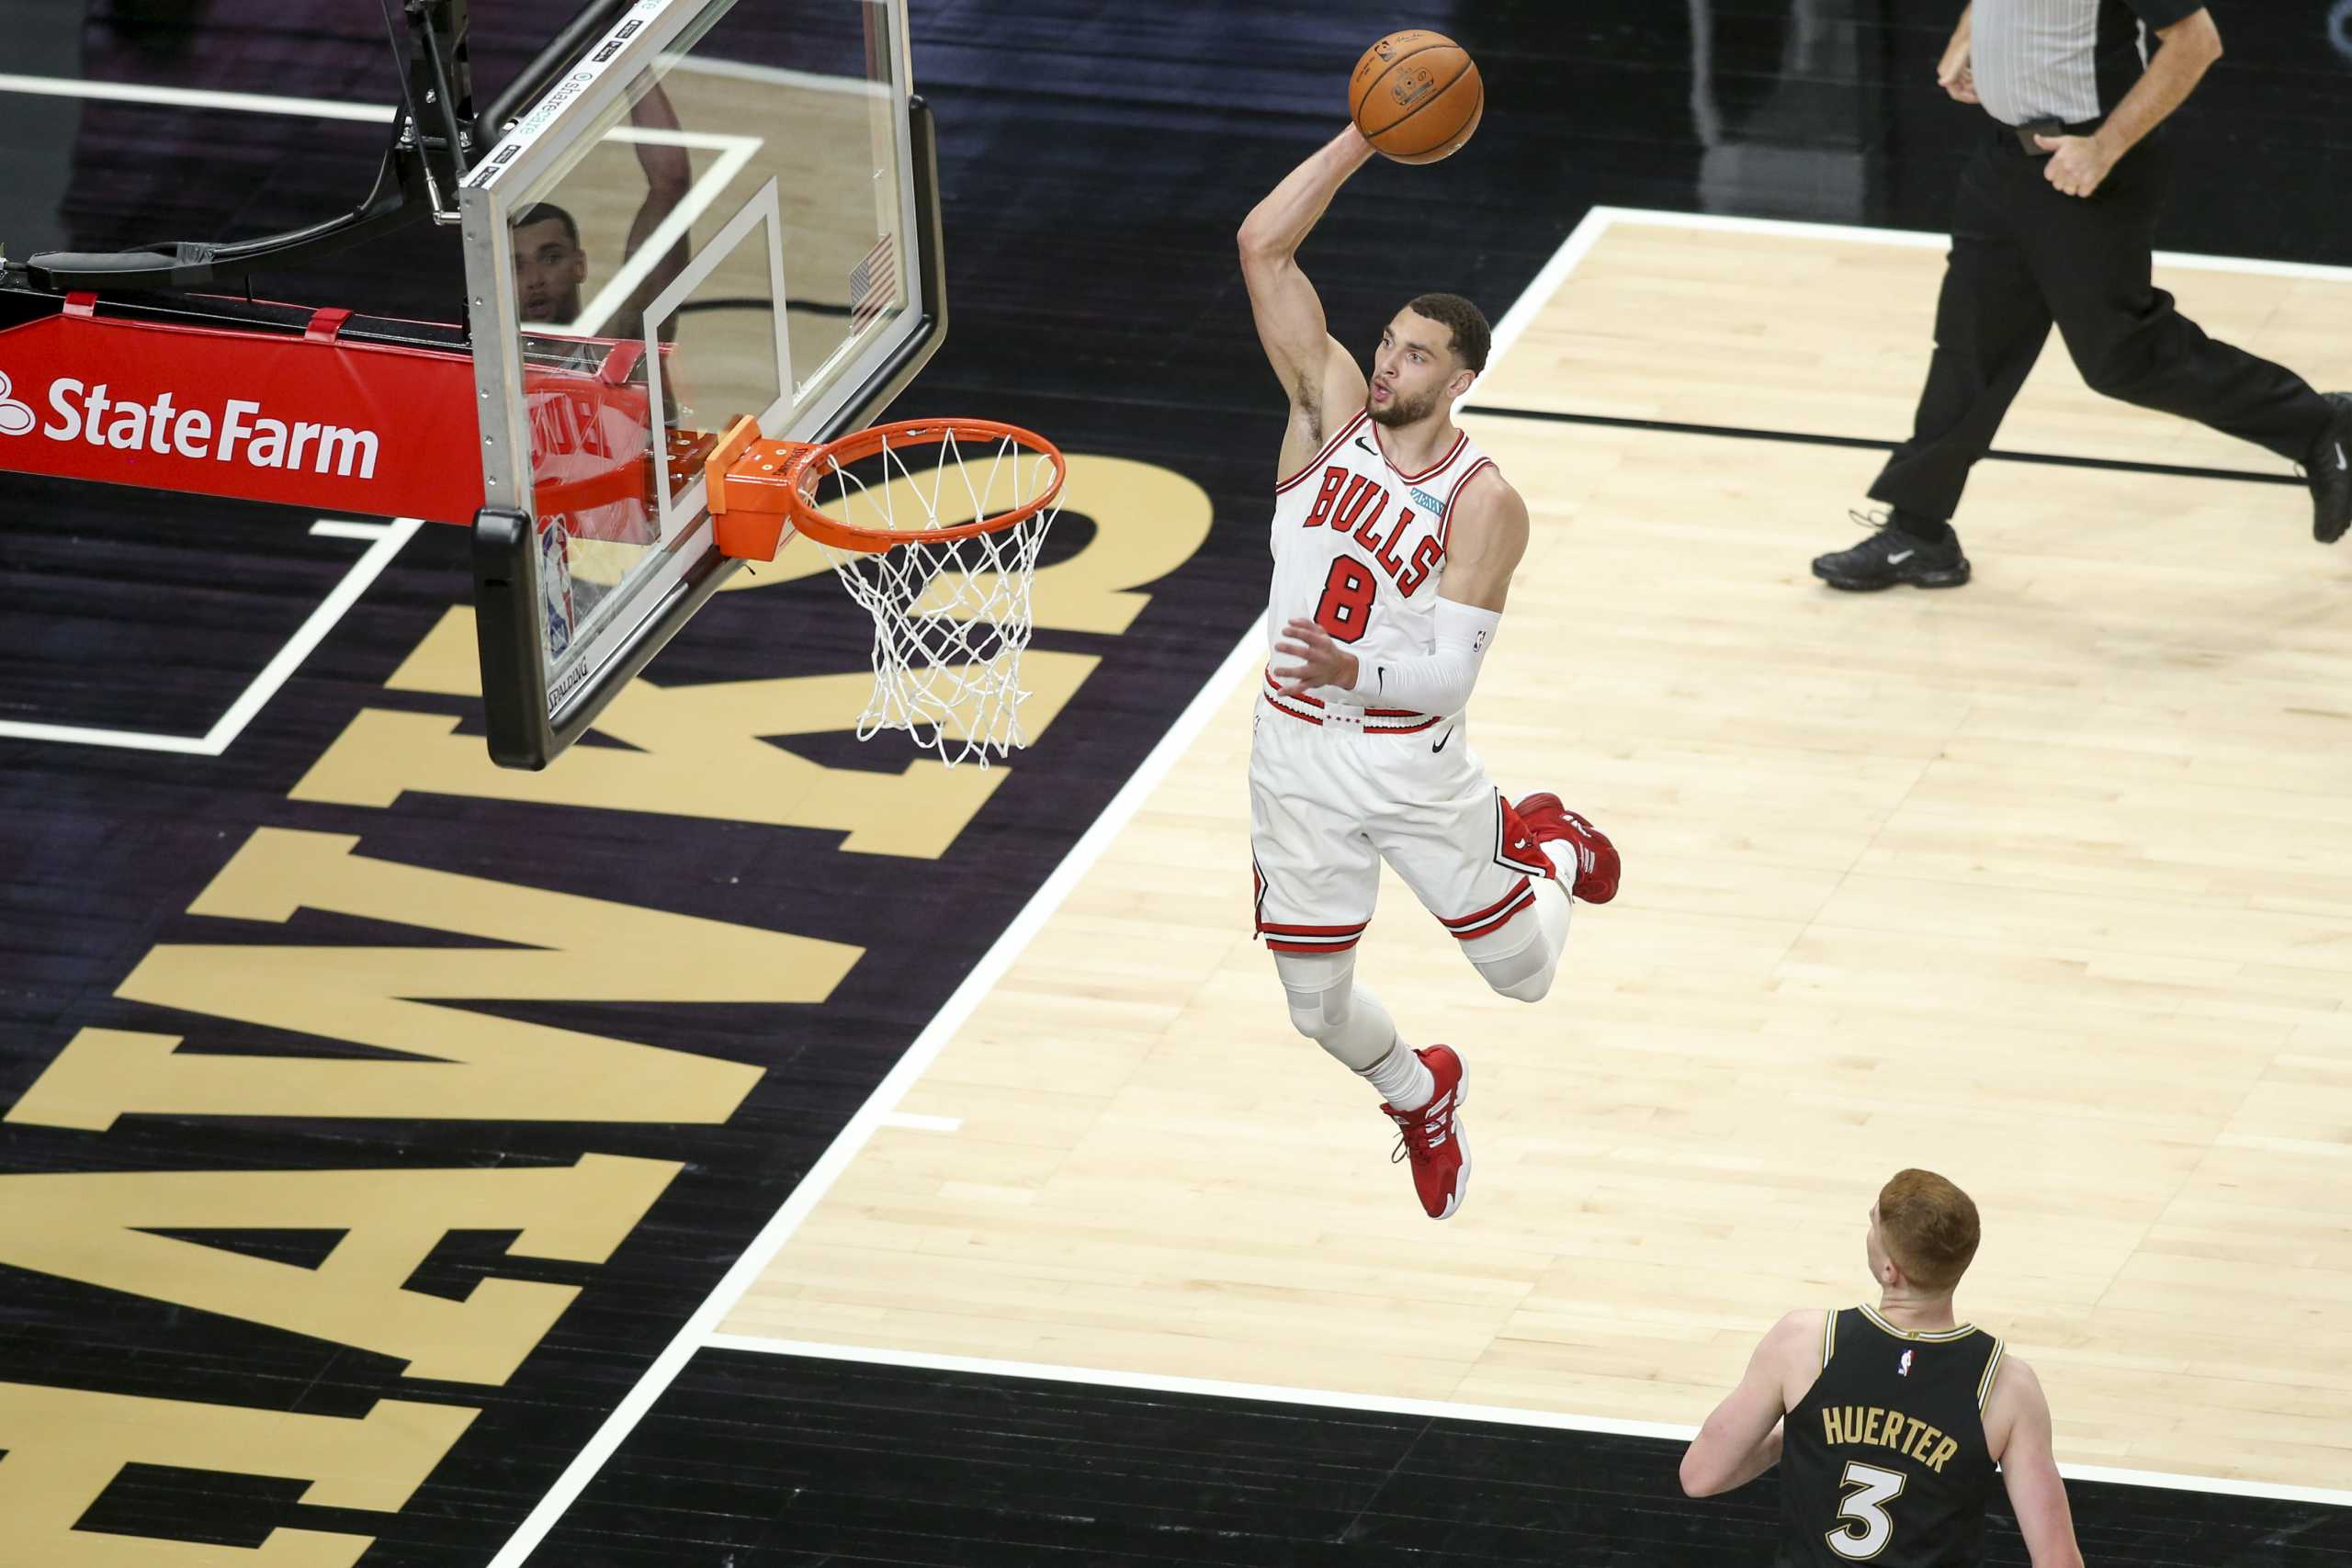 NBA: Ο Λαβίν θύμισε Τζόρνταν αλλά δεν έφτασε στους Μπουλς – Απίστευτο ματς στη Βοστώνη